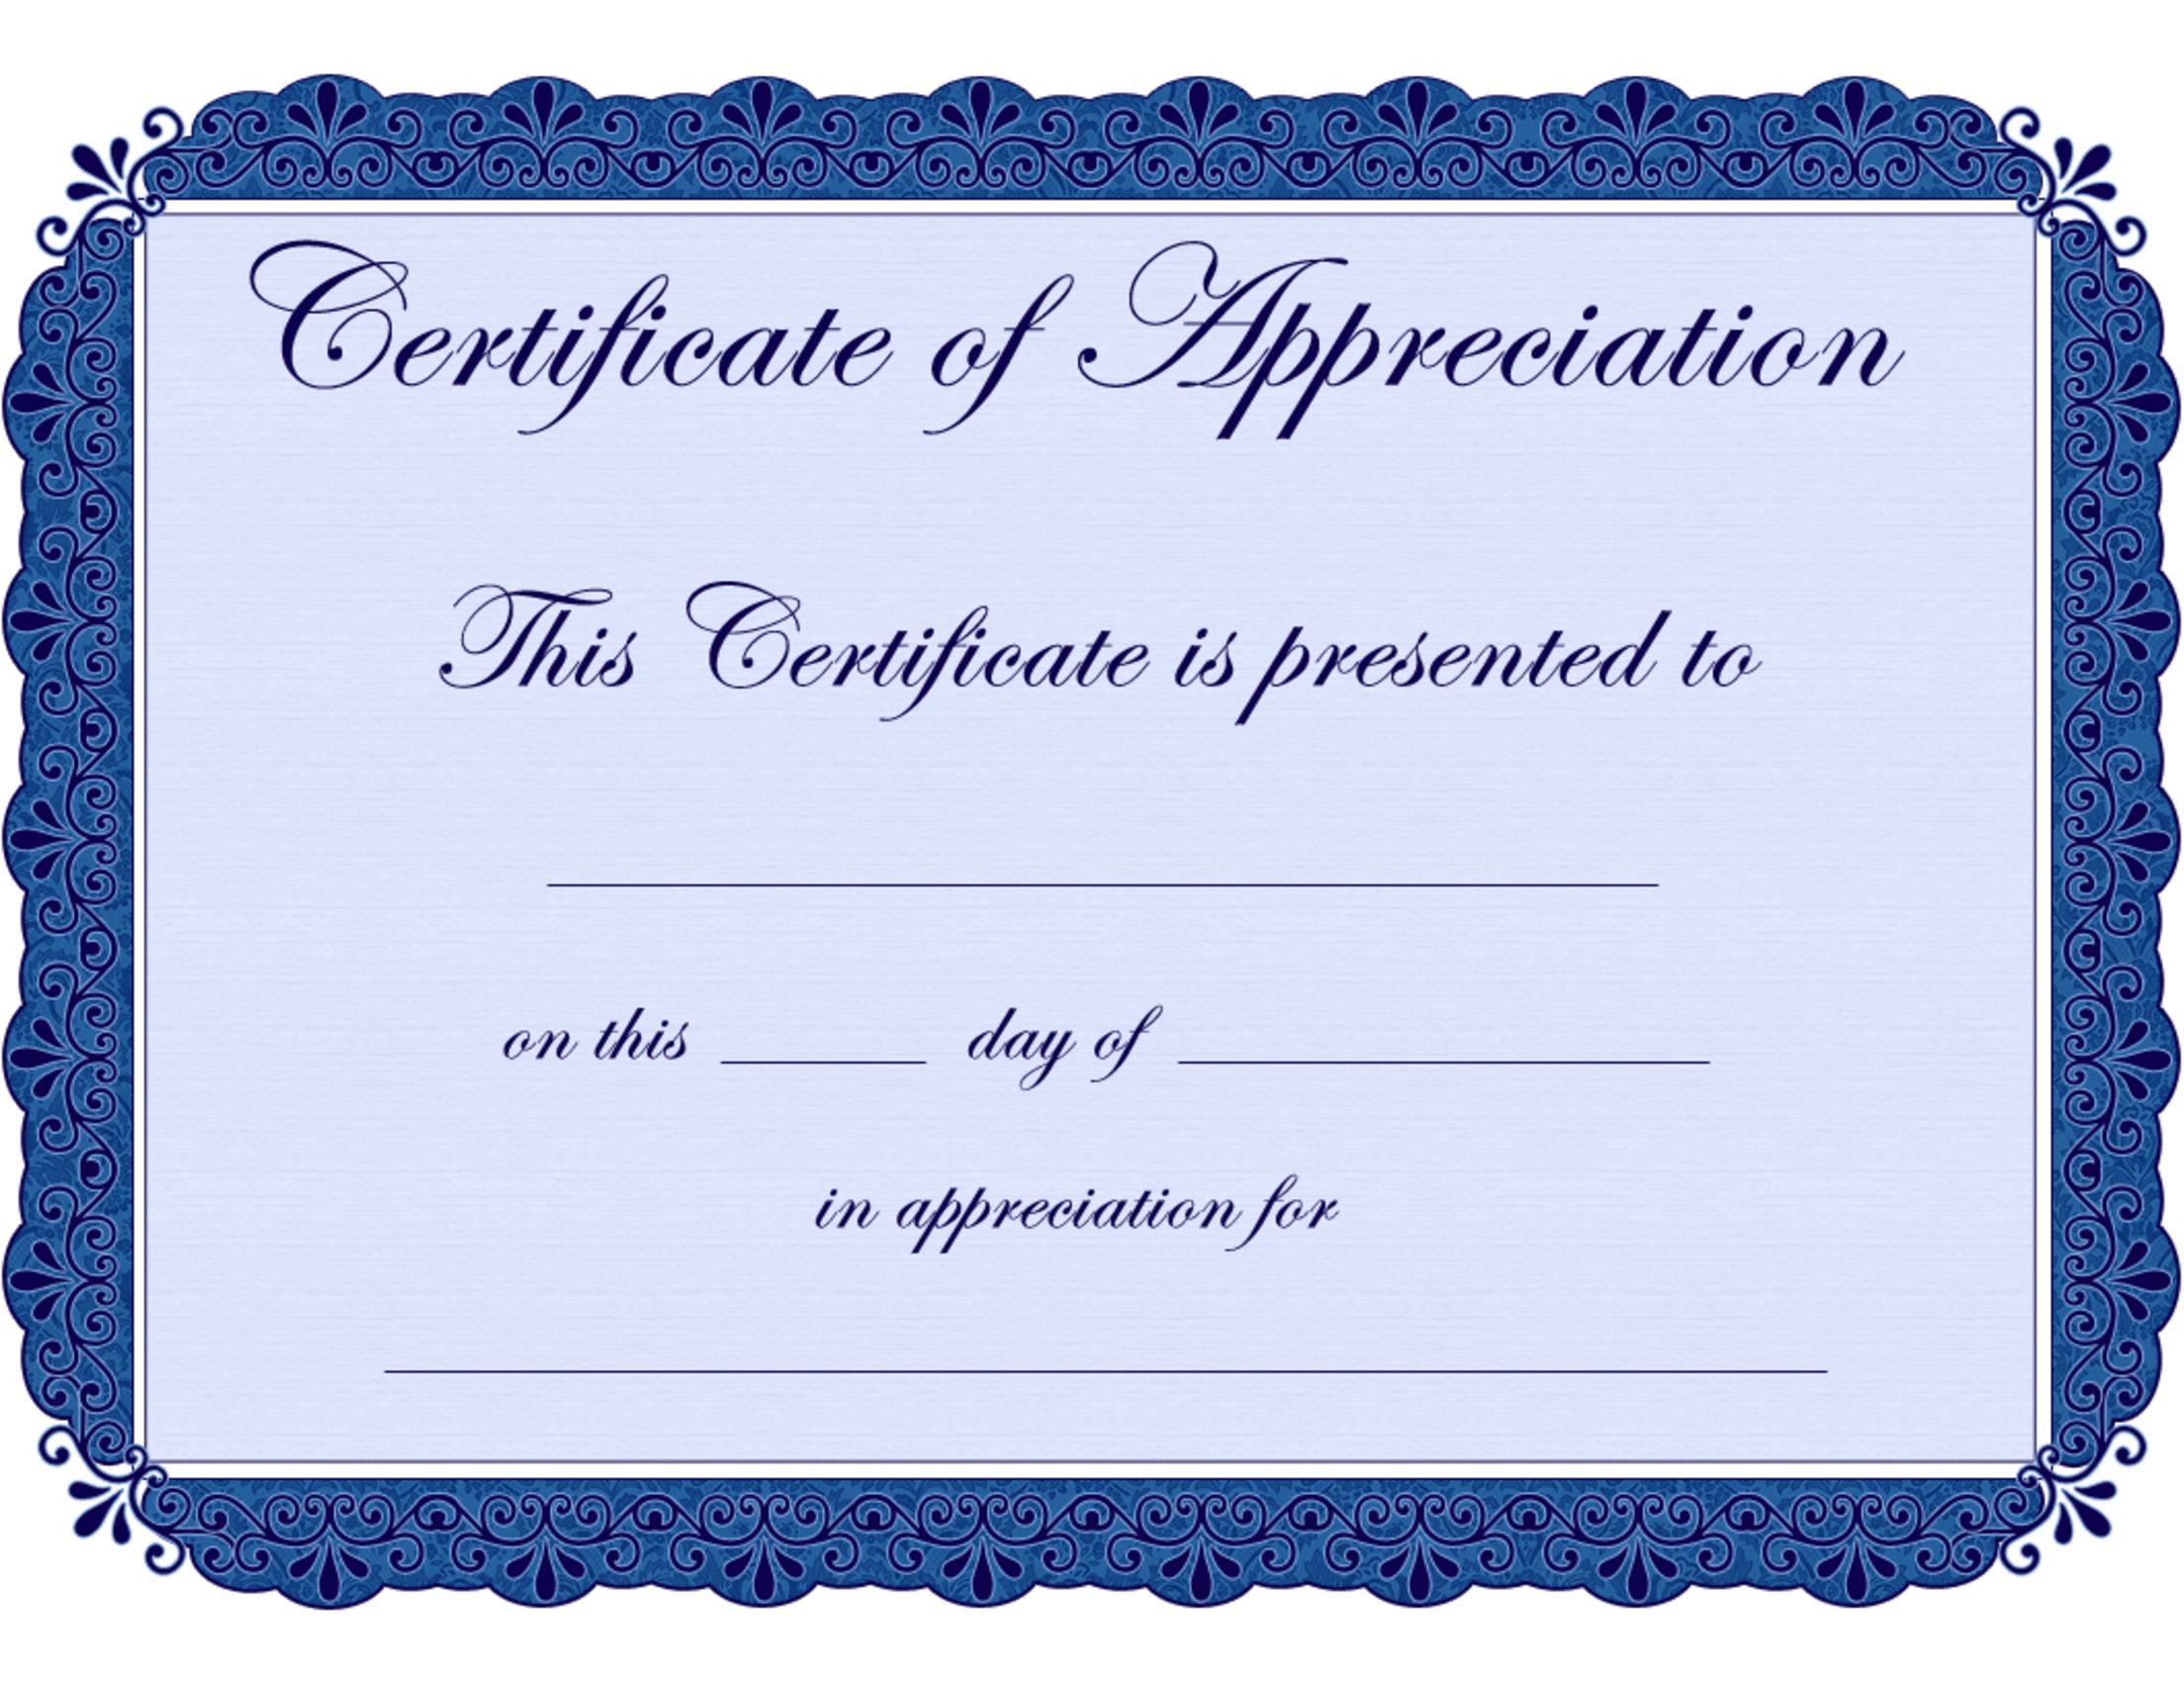 Free Printable Certificates Certificate Of Appreciation Certificate - Commitment Certificate Free Printable